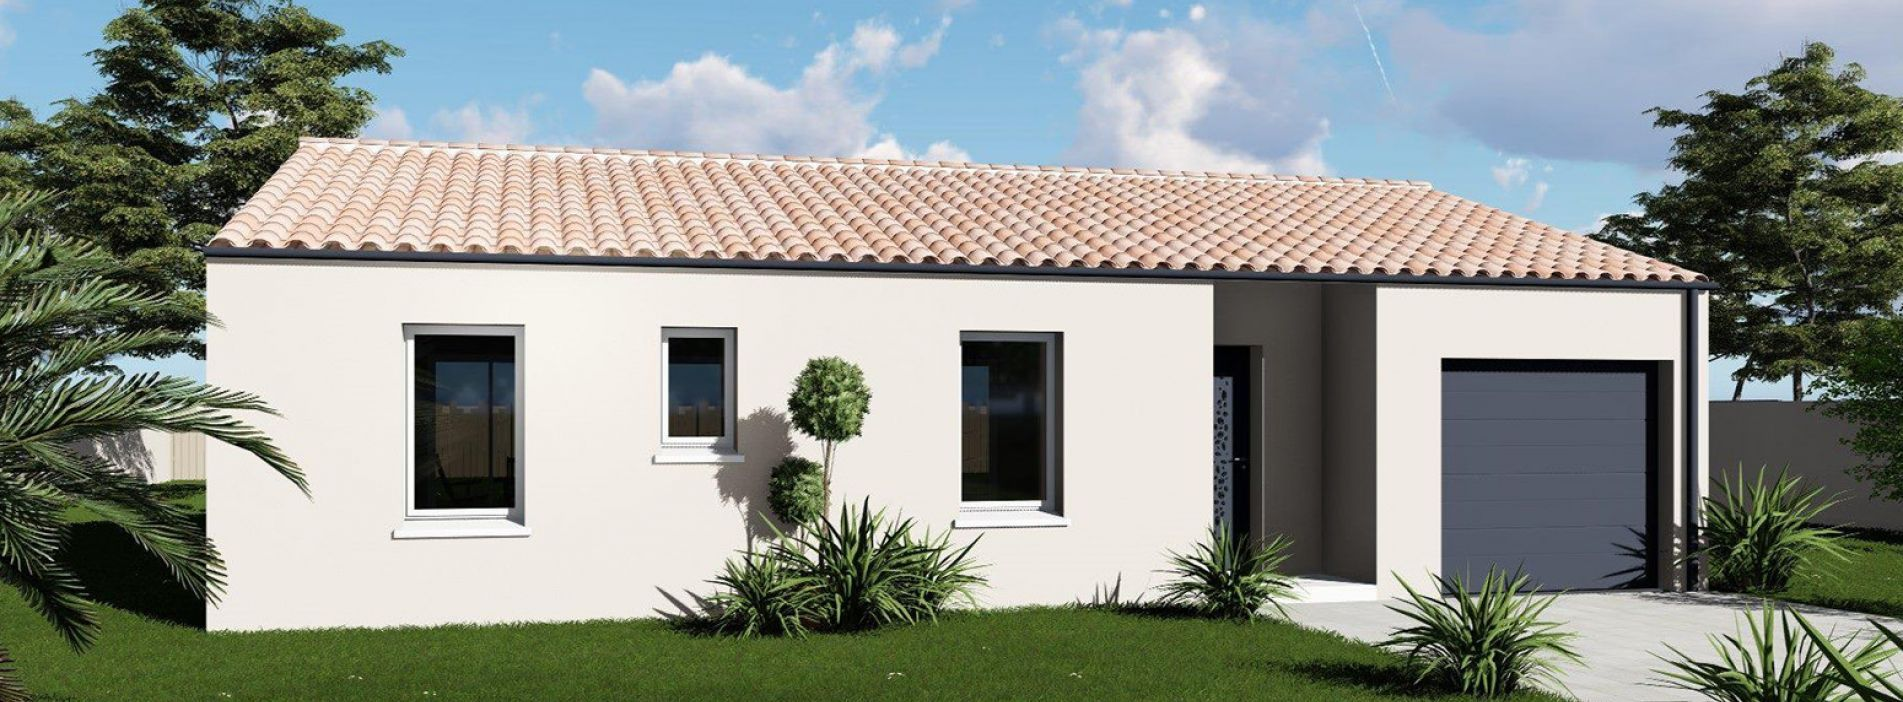 Image Maison 85.12 m² avec terrain à CAMPUGNAN (GIRONDE - 33)